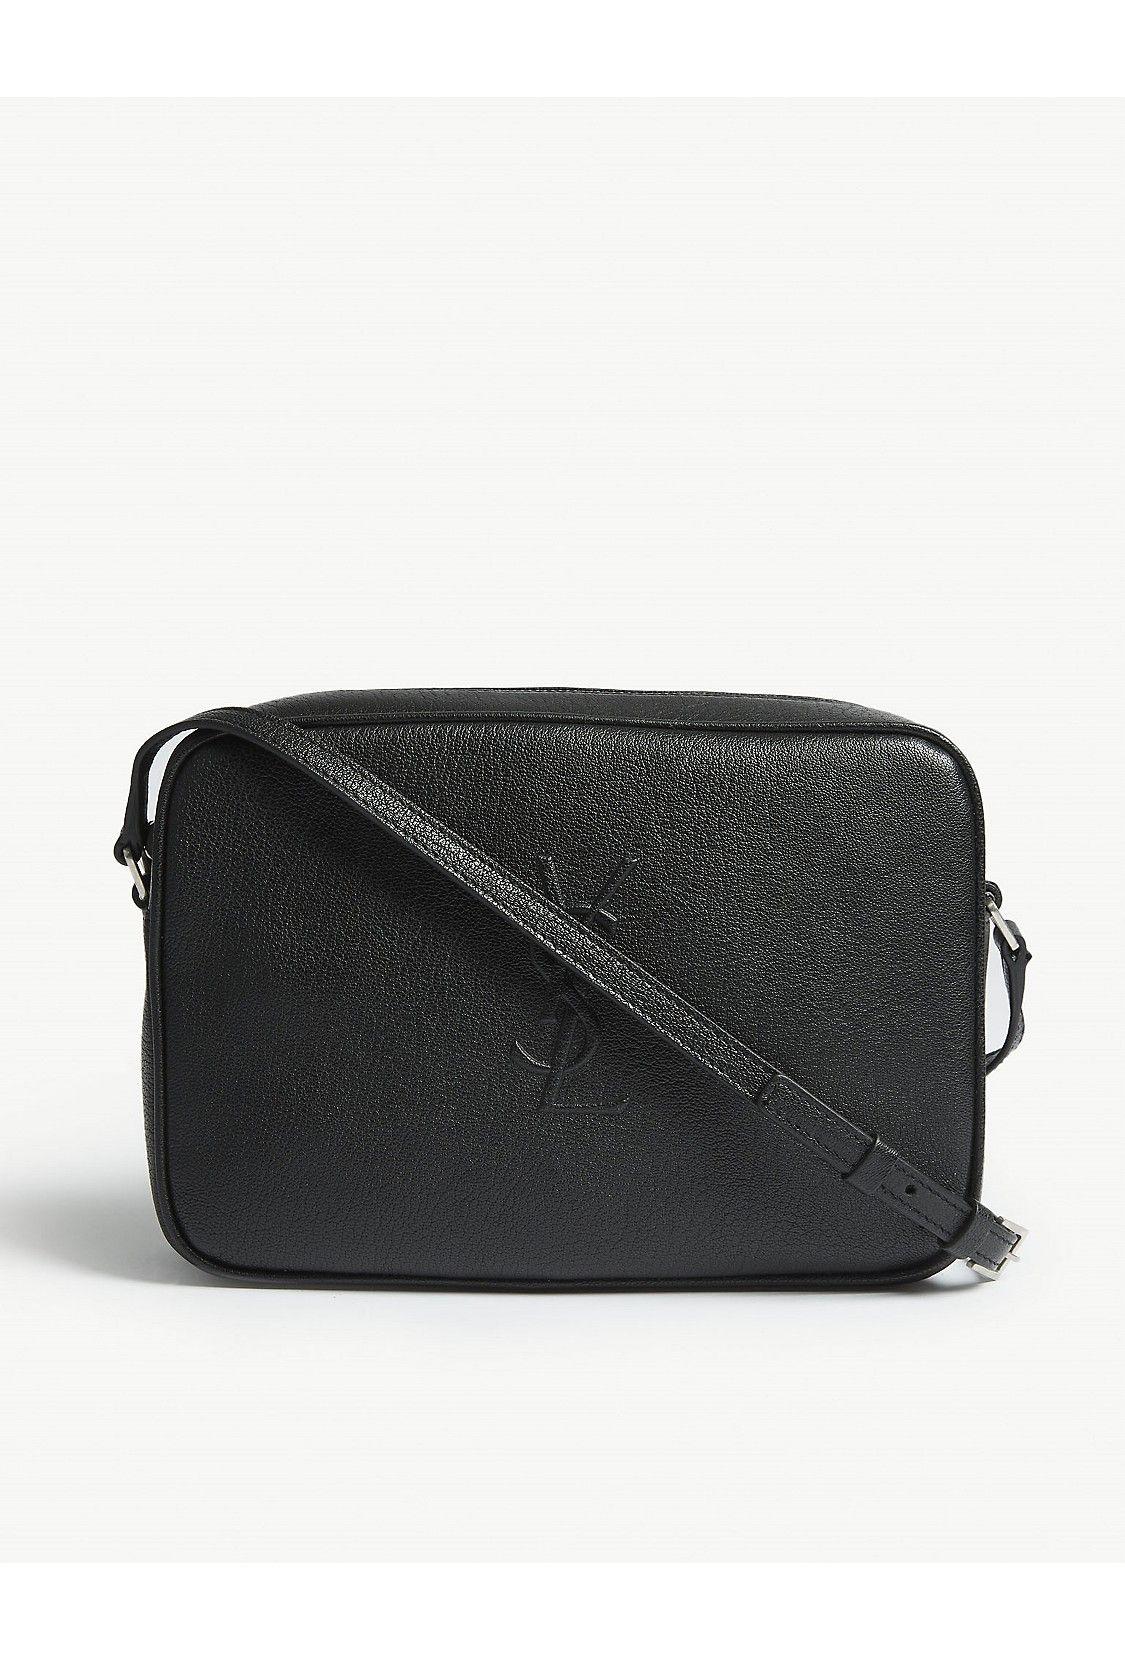 7f95e3680ee SAINT LAURENT Mono Lou leather camera bag in 2019 | YSL Camera bag ...